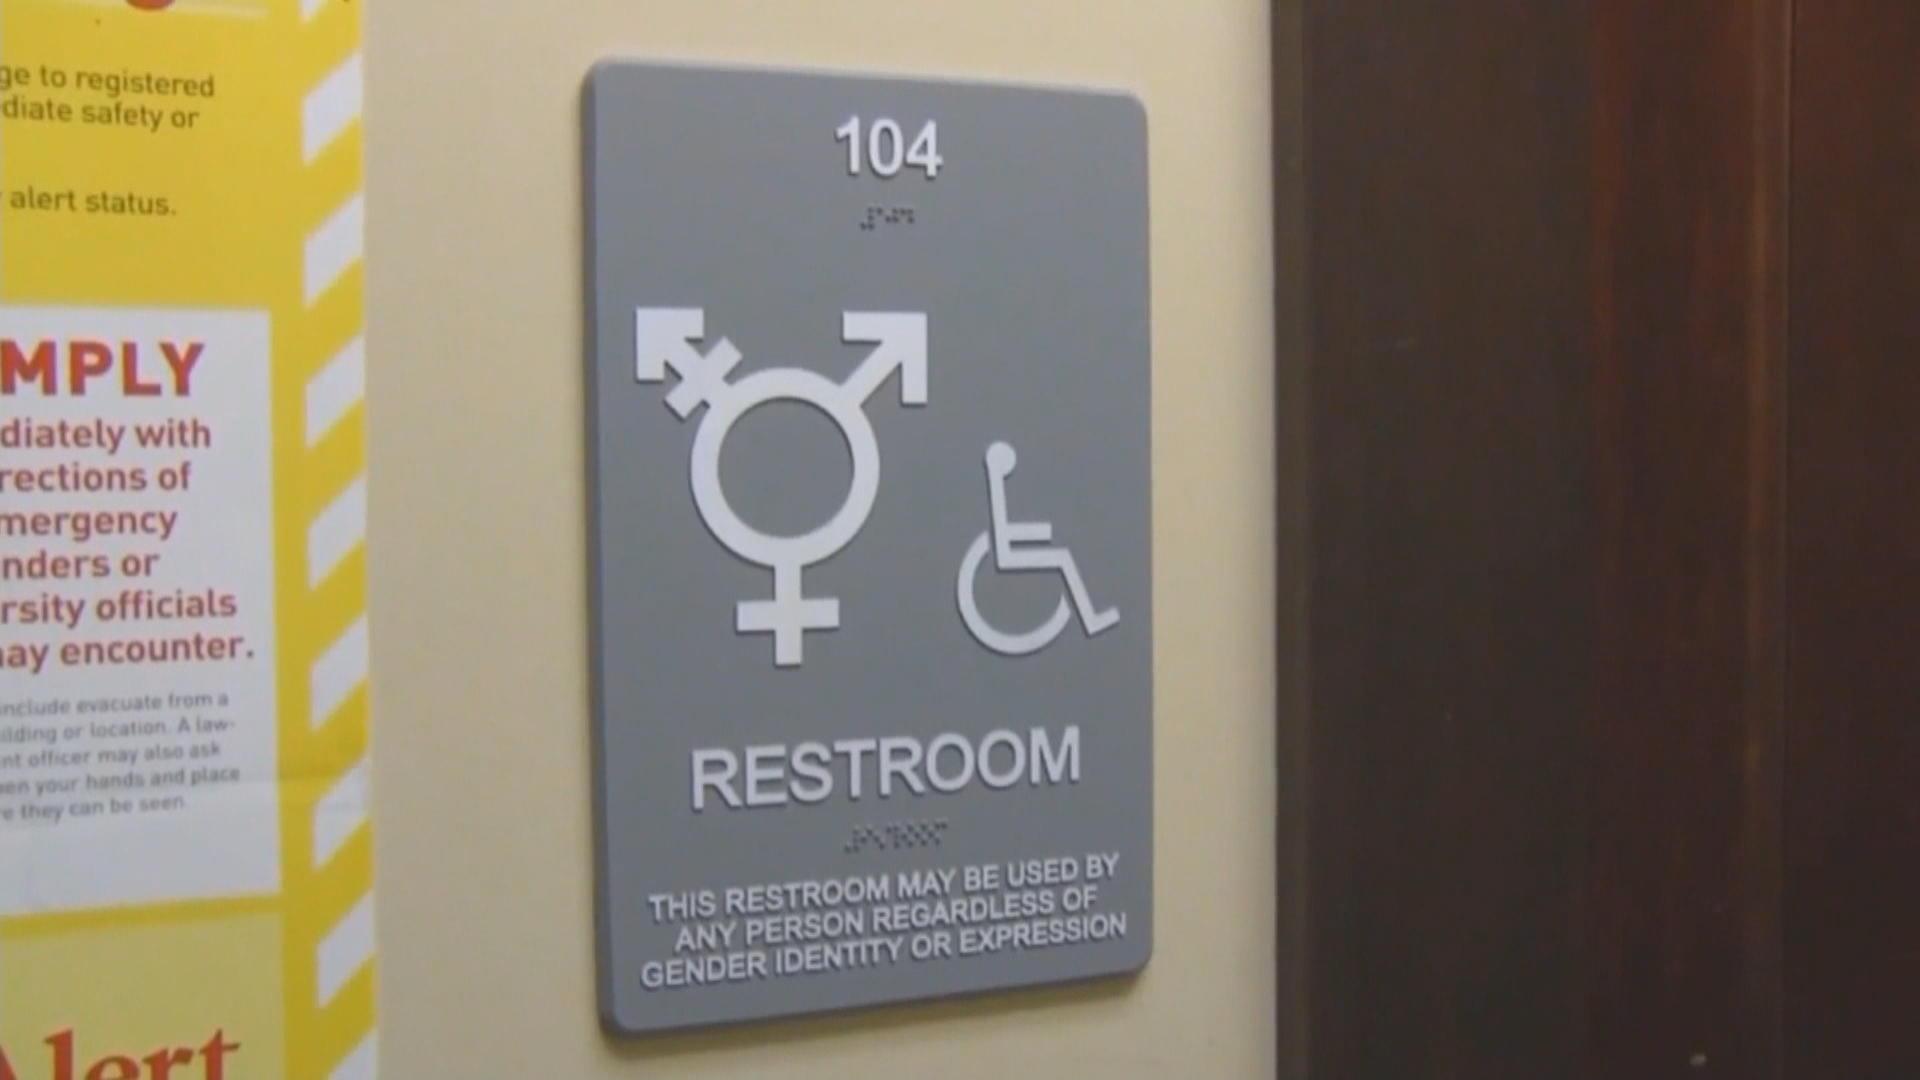 Bathroom Bill in texas, it's businesses vs. the bathroom bill - cbs news